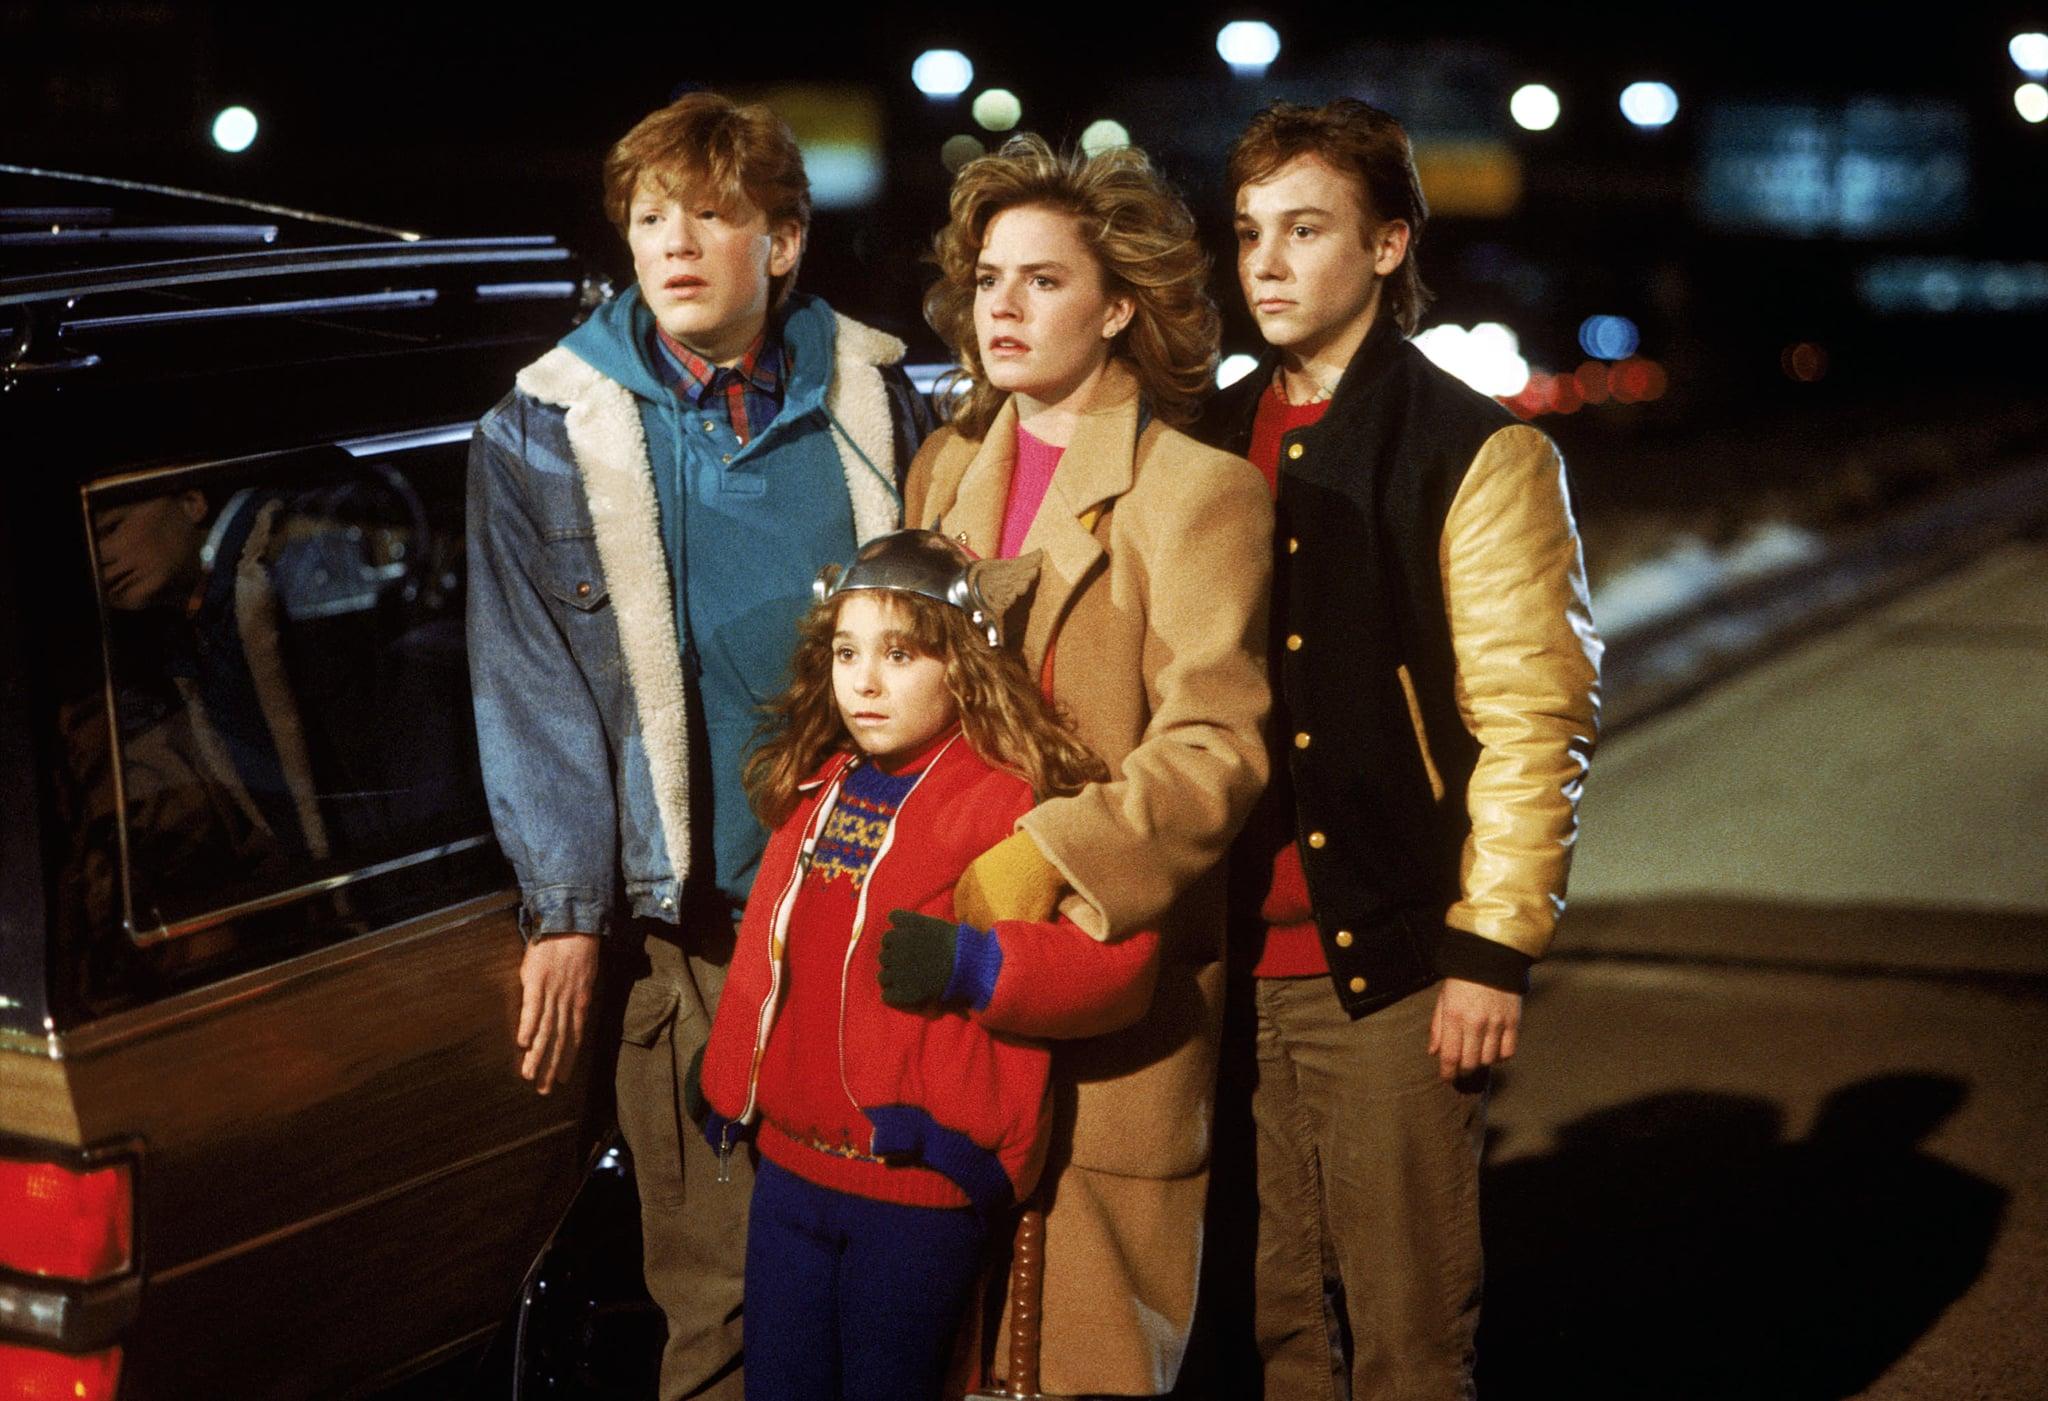 ADVENTURES IN BABYSITTING, Anthony Rapp, Maia Brewton, Elisabeth Shue, Keith Coogan, 1987, (c) Buena Vista/courtesy Everett Collection